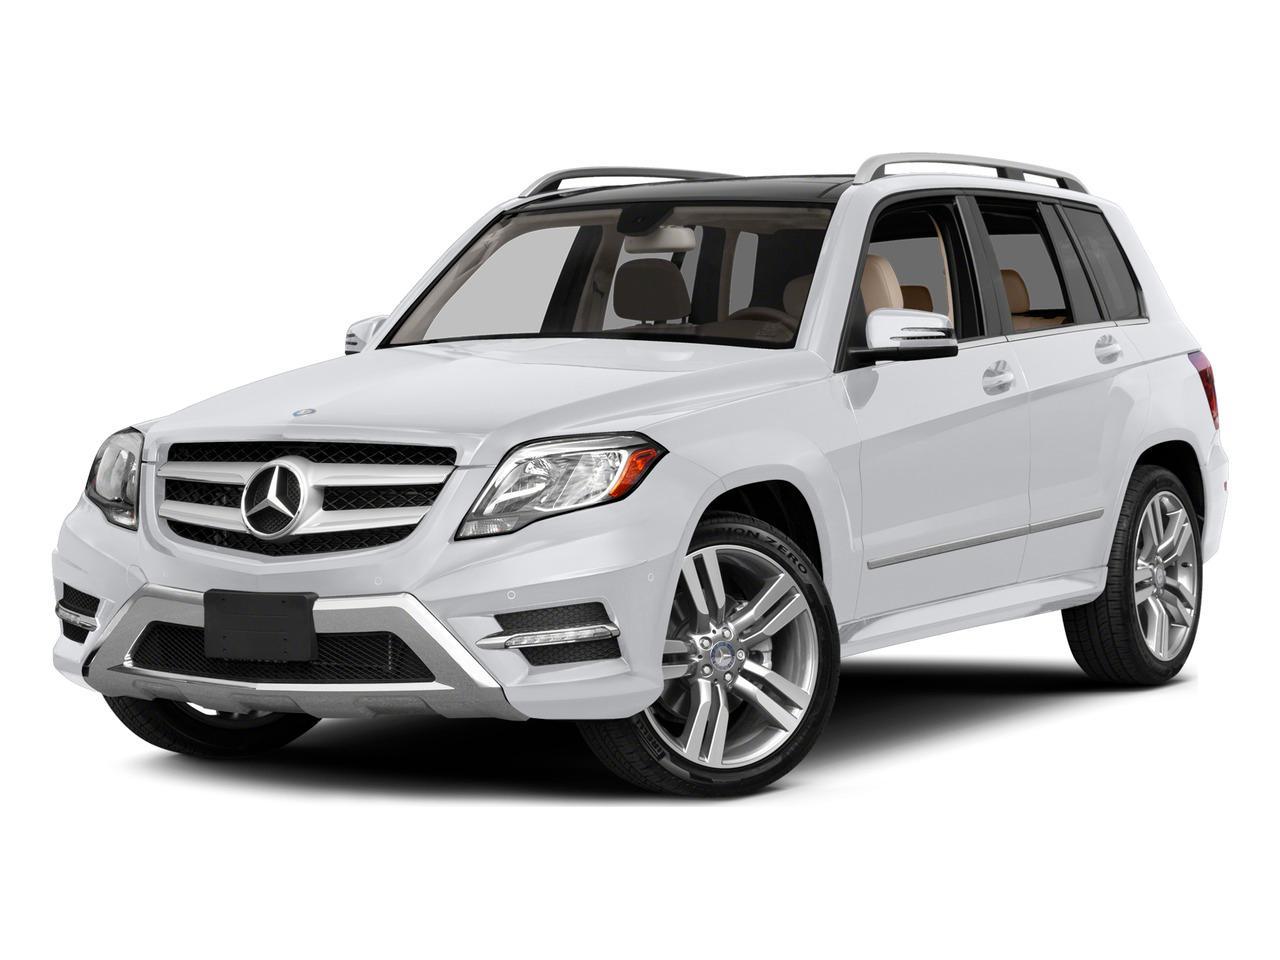 2015 Mercedes-Benz GLK-Class Vehicle Photo in Flemington, NJ 08822